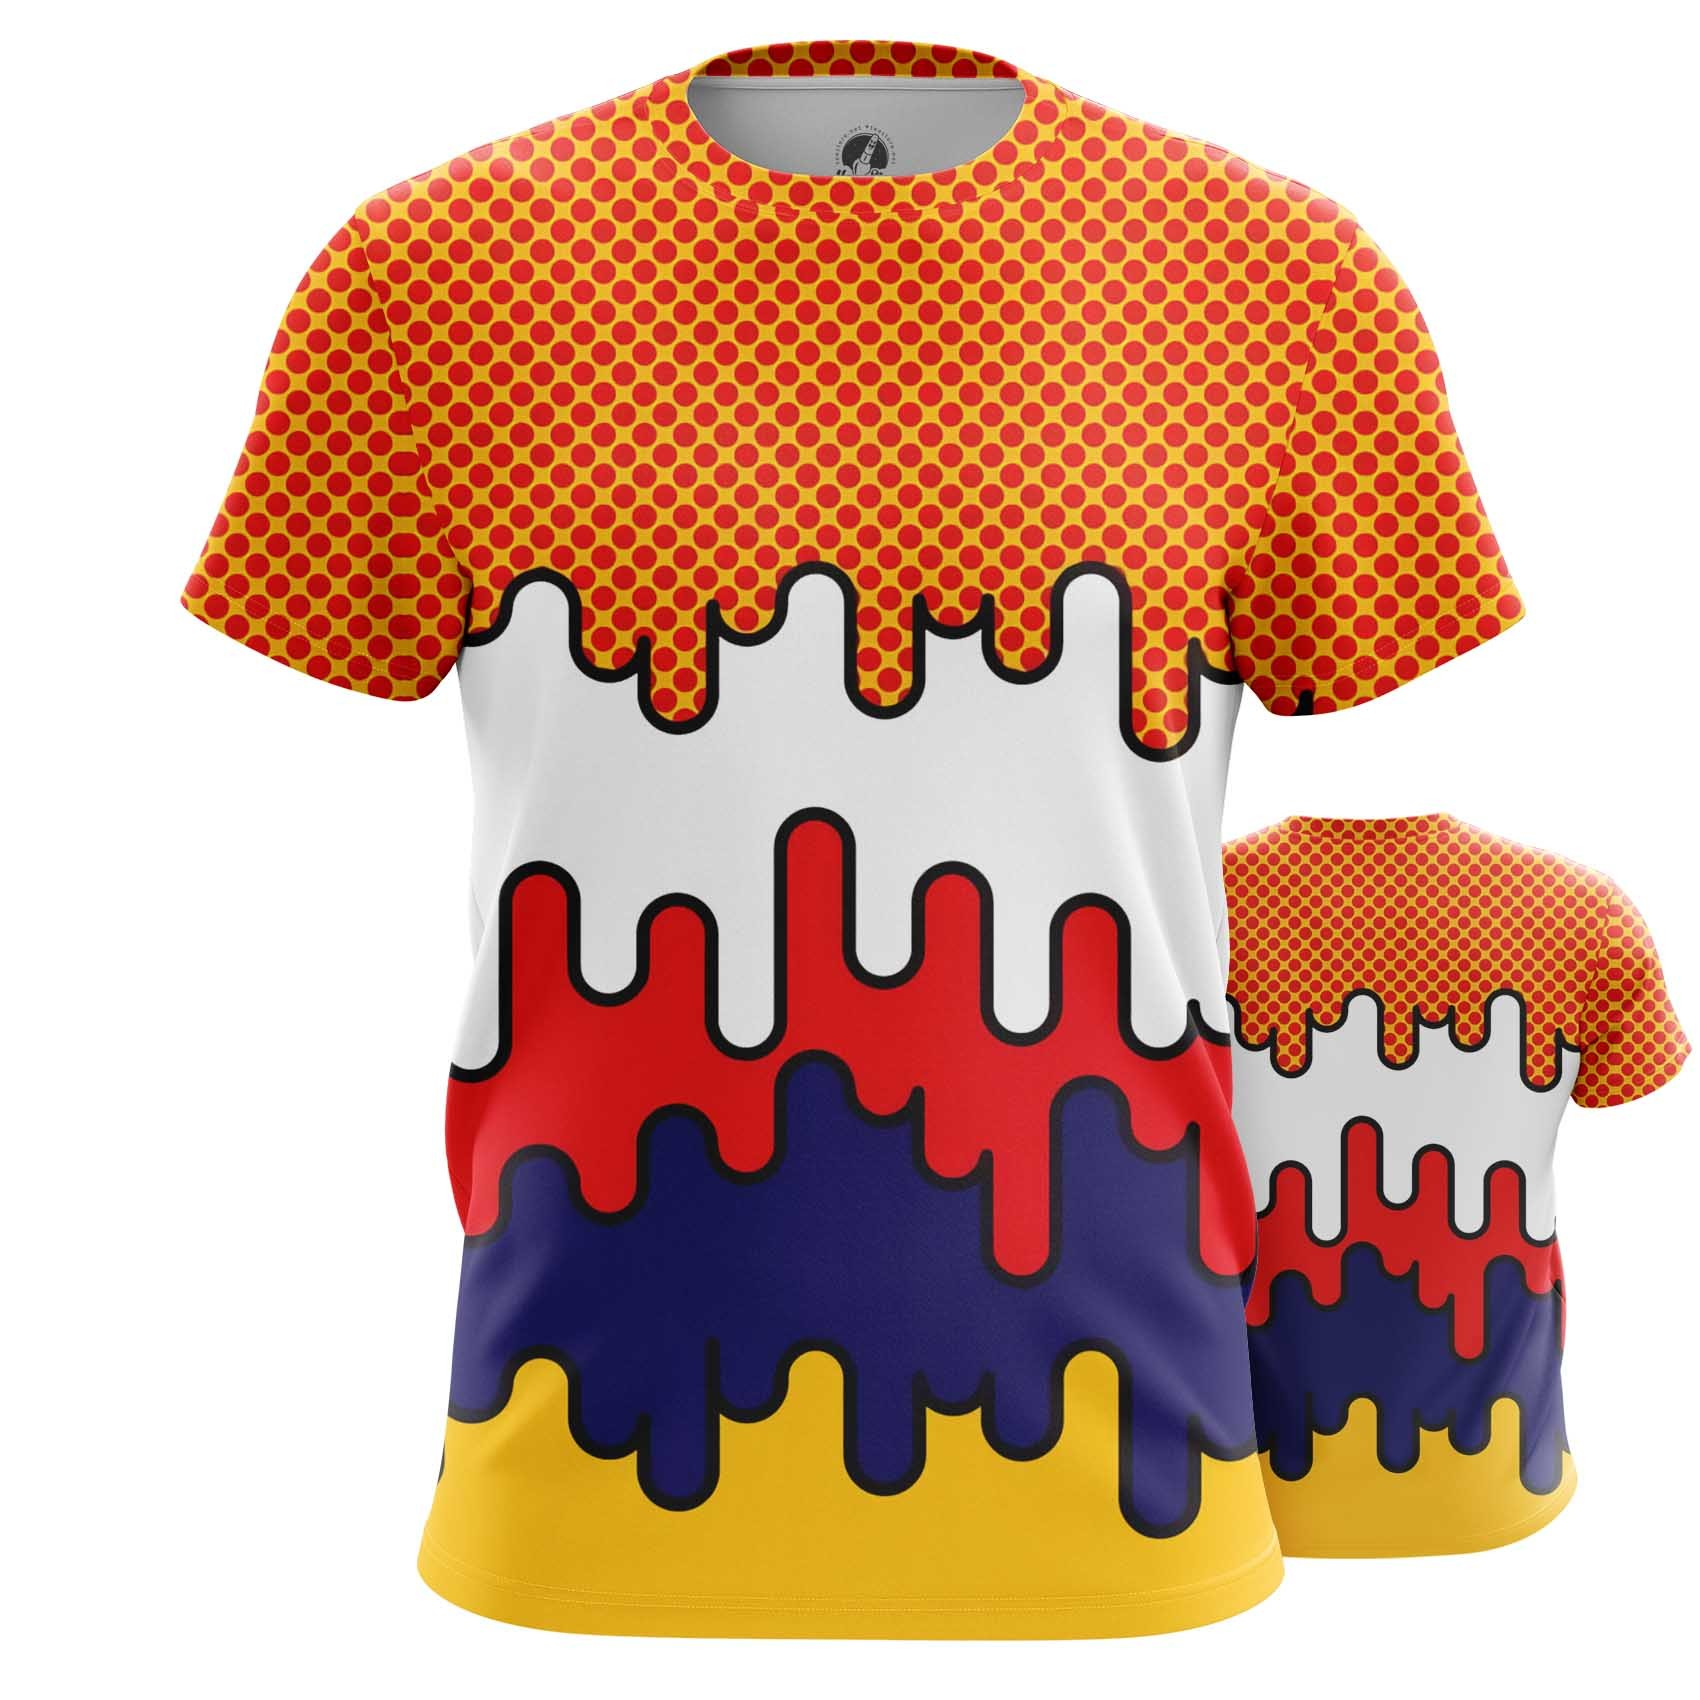 Collectibles T-Shirt Comics Patterns Pop Art Inspired Textures